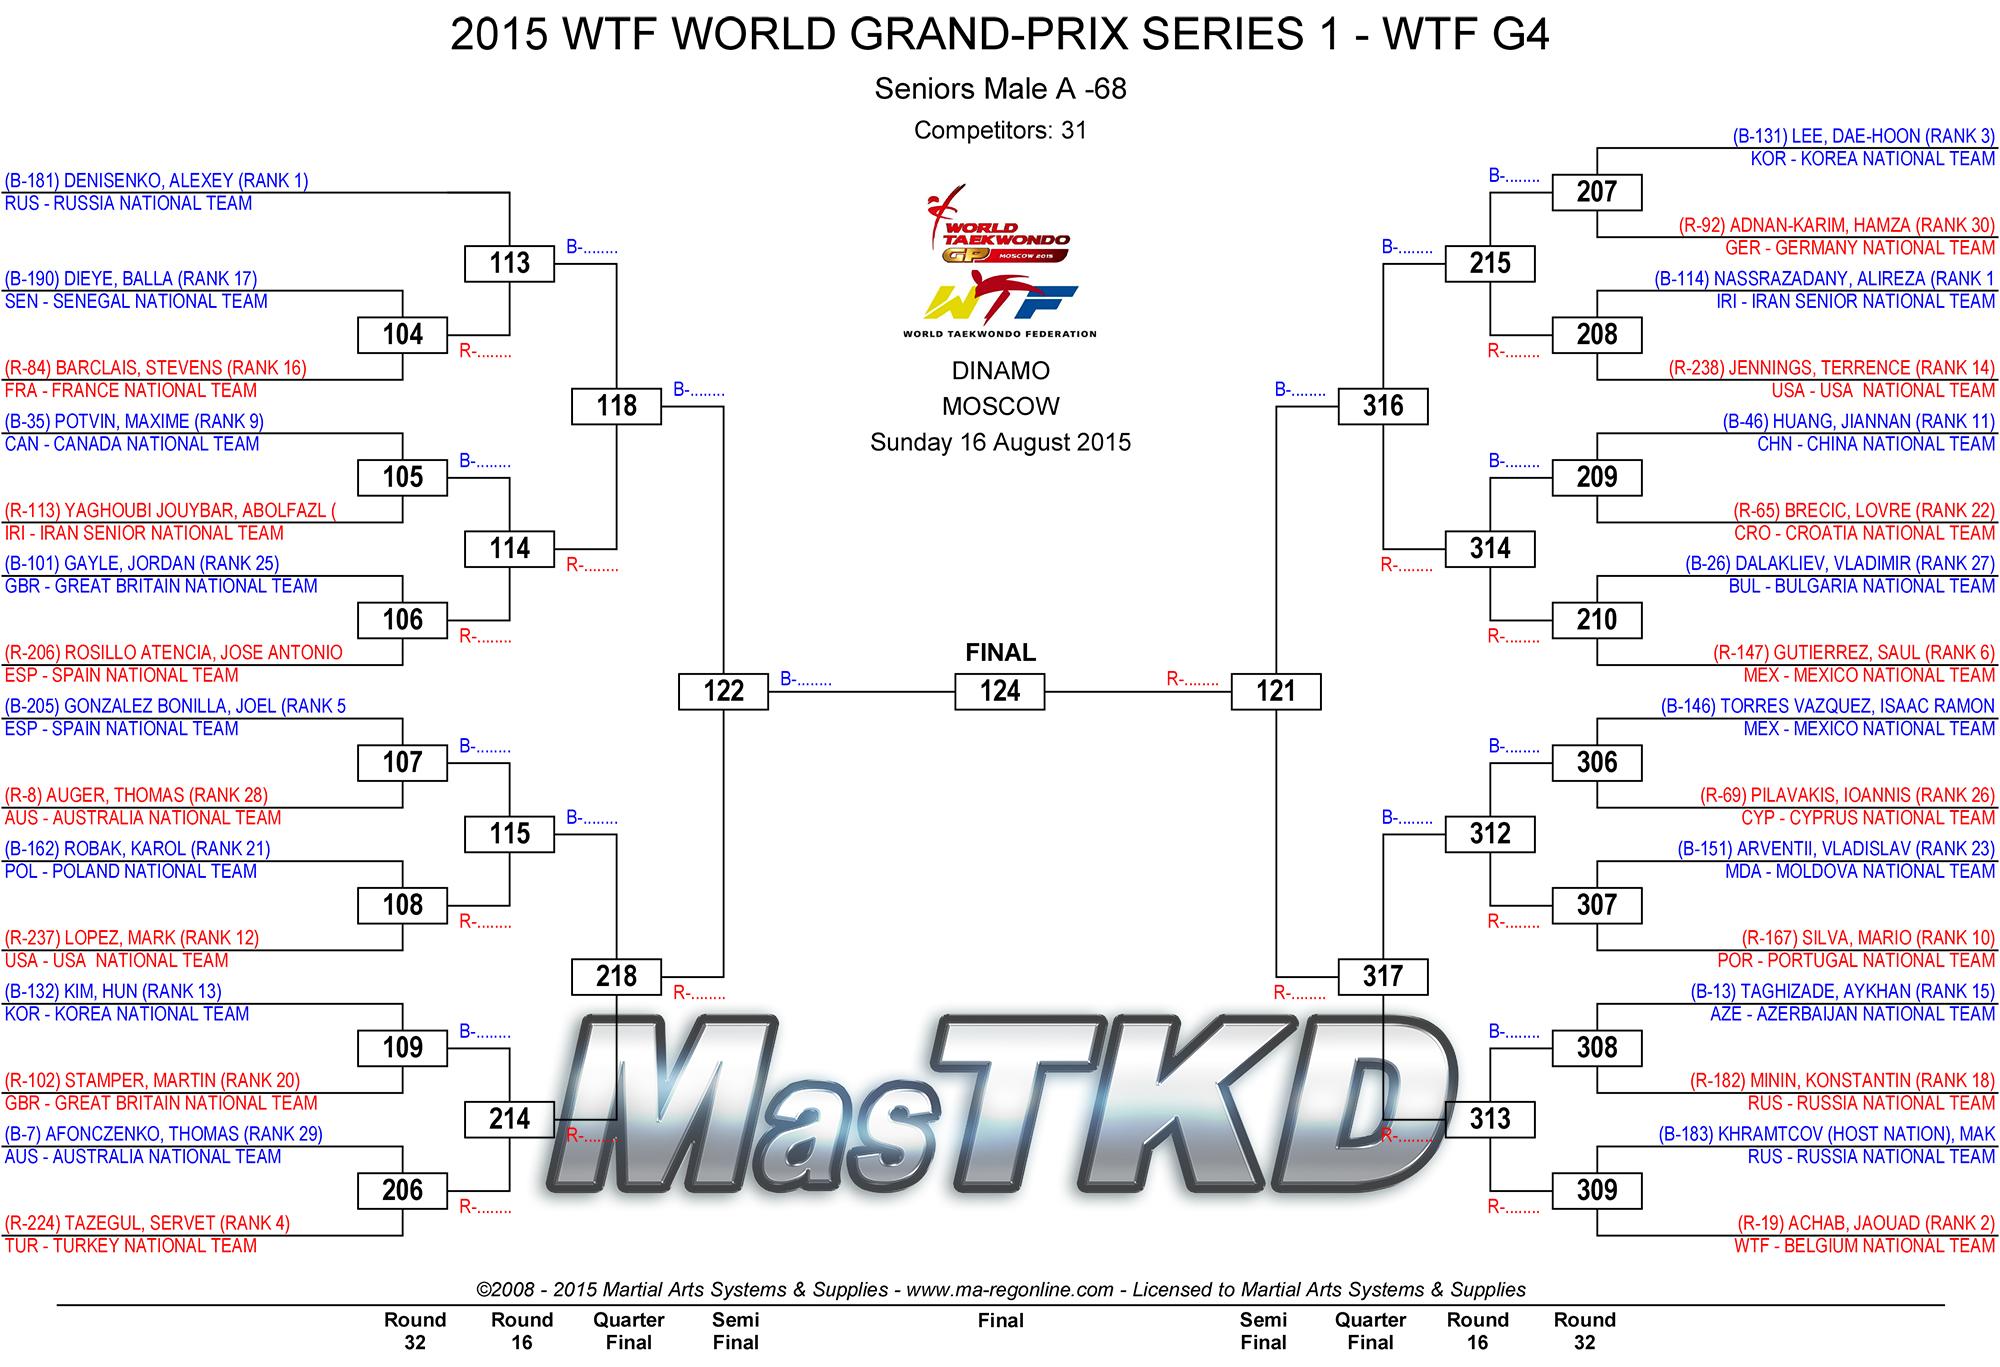 2015_WTF_WORLD_GRAND-PRIX_SERIES_1_DRAW_DAY-3_M-68